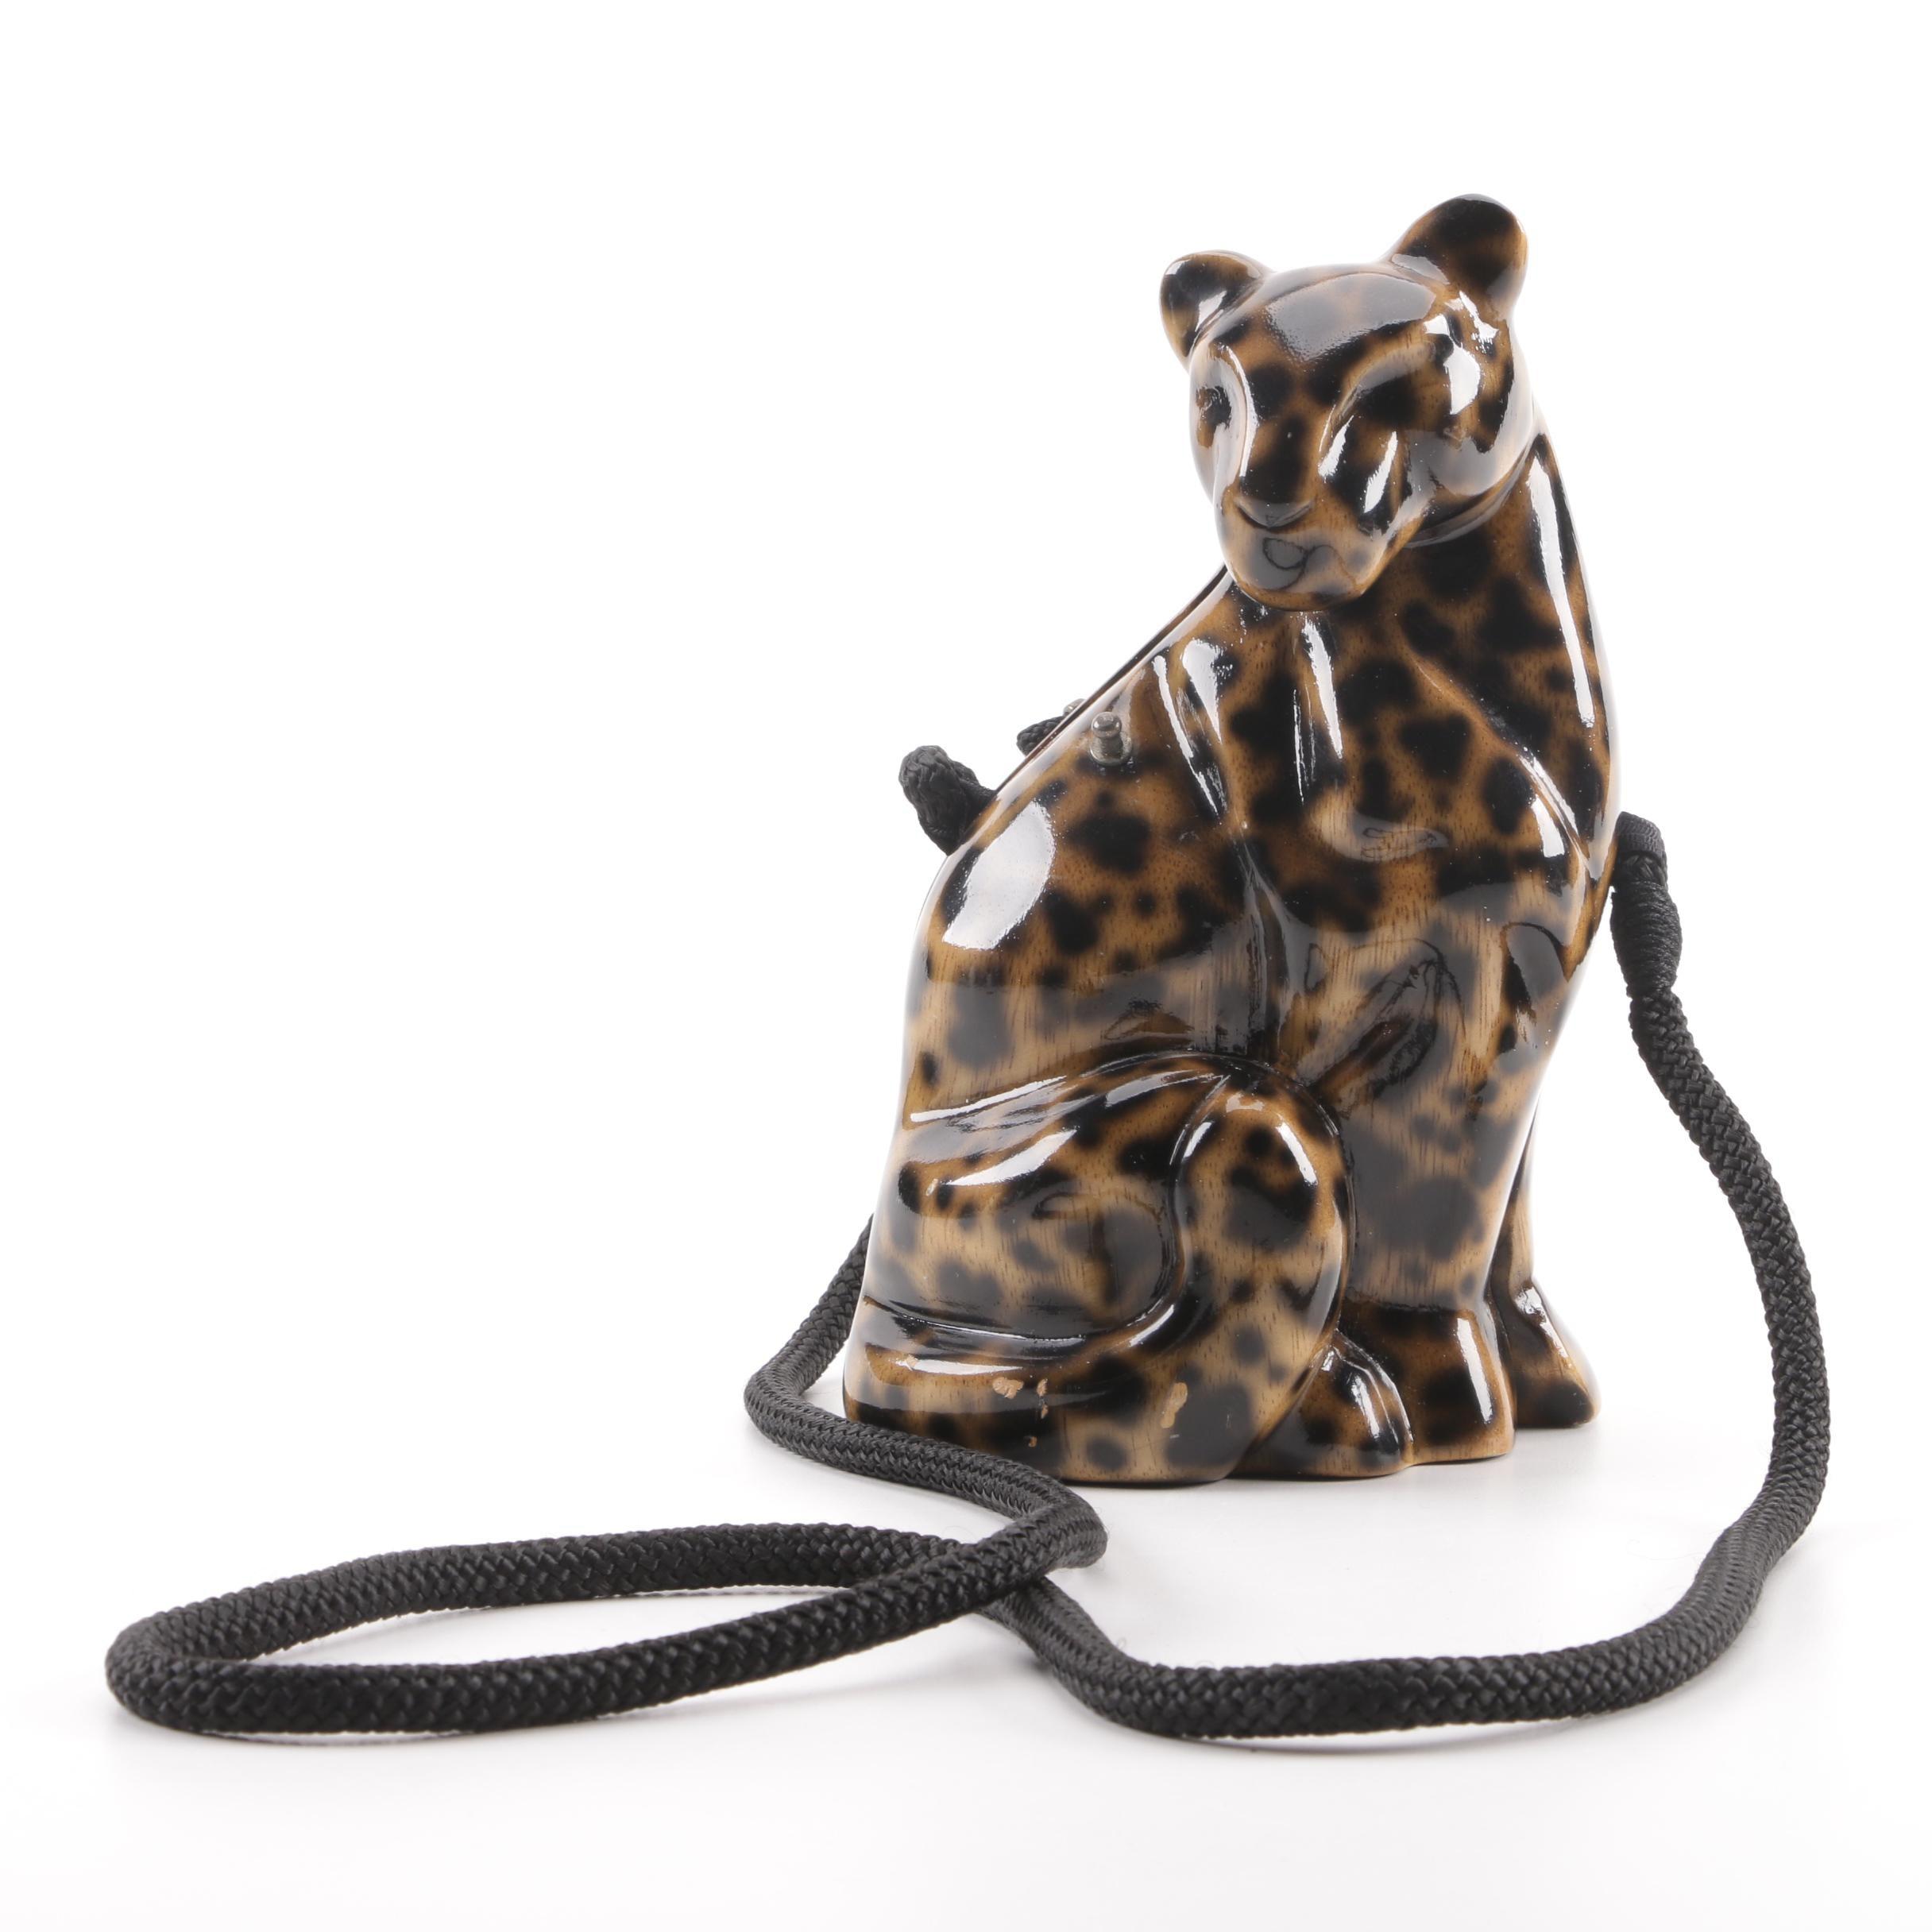 Timmy Woods of Beverly Hills Cheetah Handbag